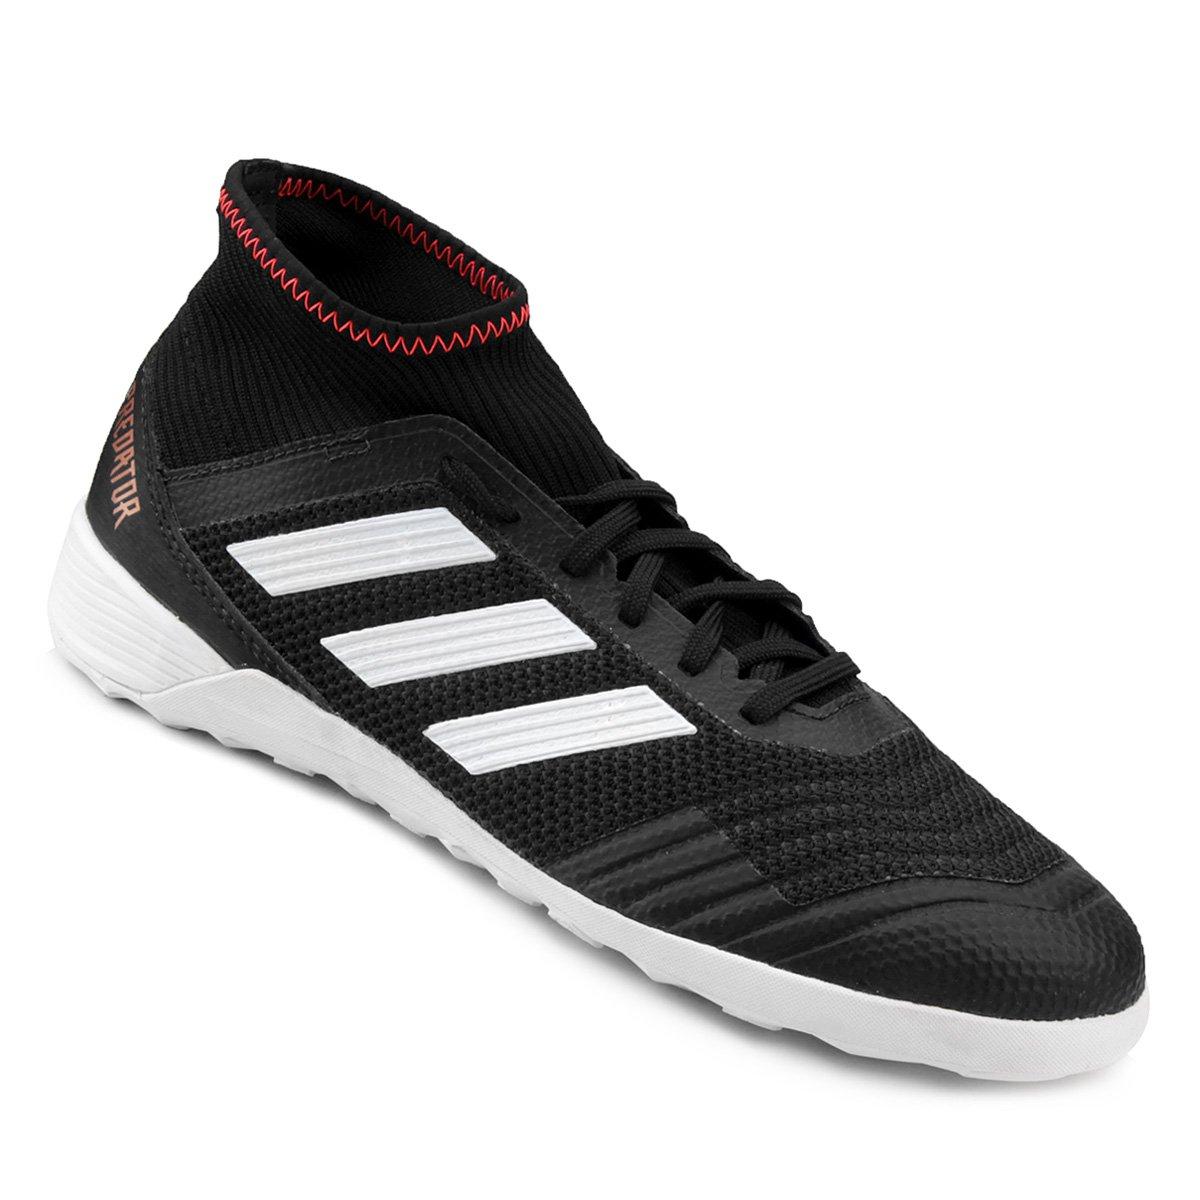 0be6b4b638 Chuteira Futsal Adidas Predator 18 3 IN